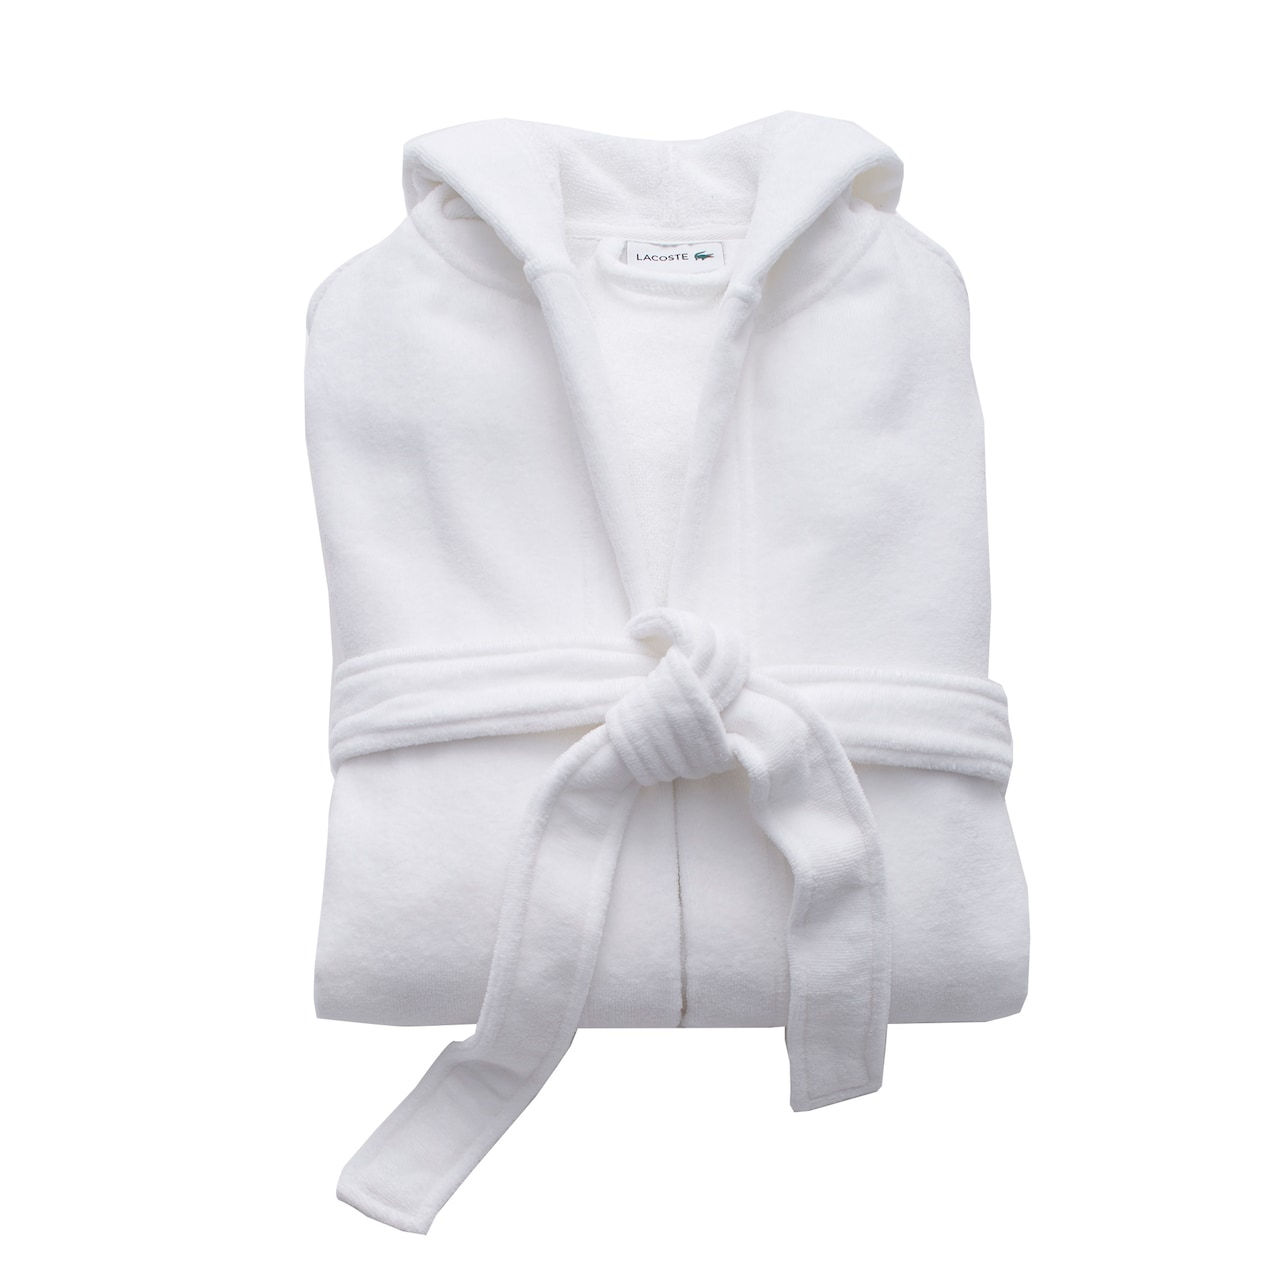 Fairplay Velour Robe